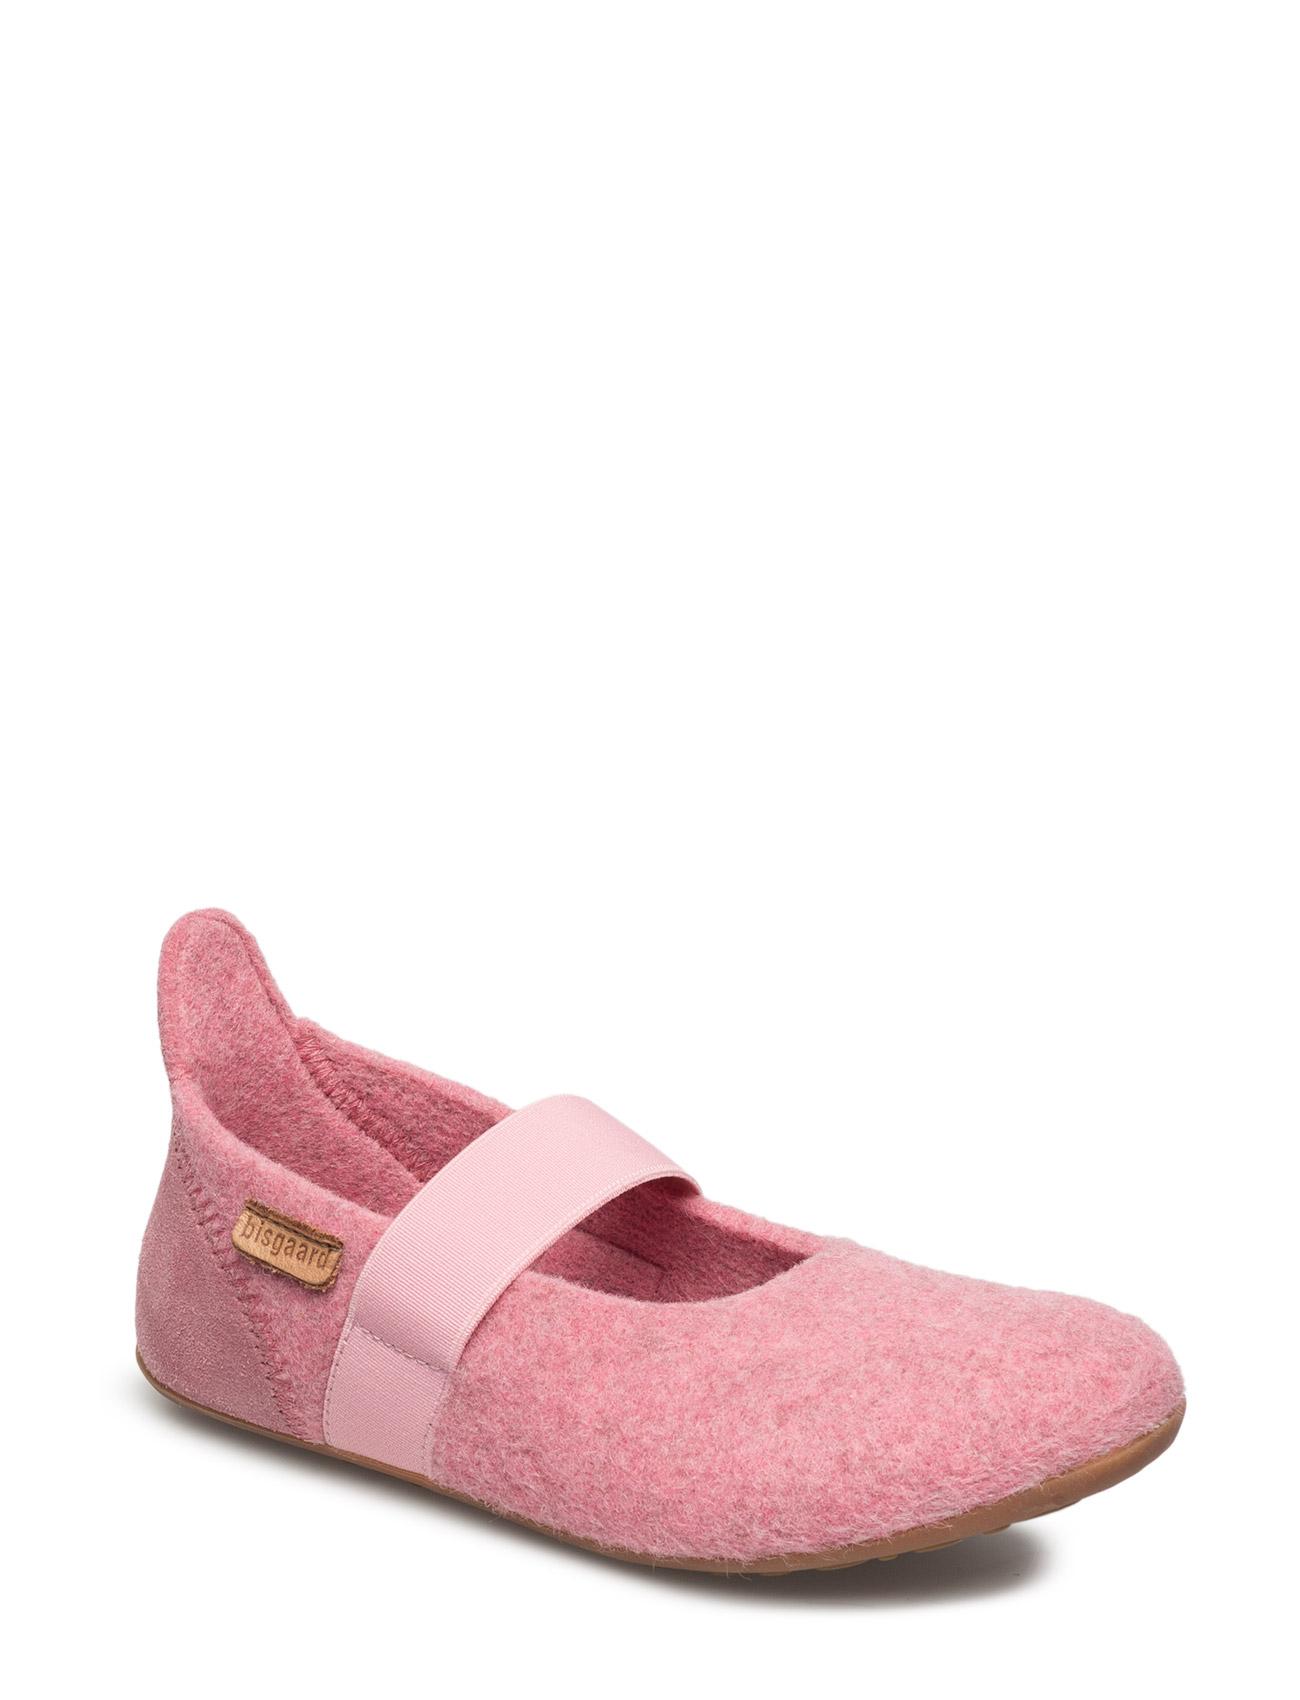 Home Shoe -  Wool Ballet Bisgaard Ballarinaer